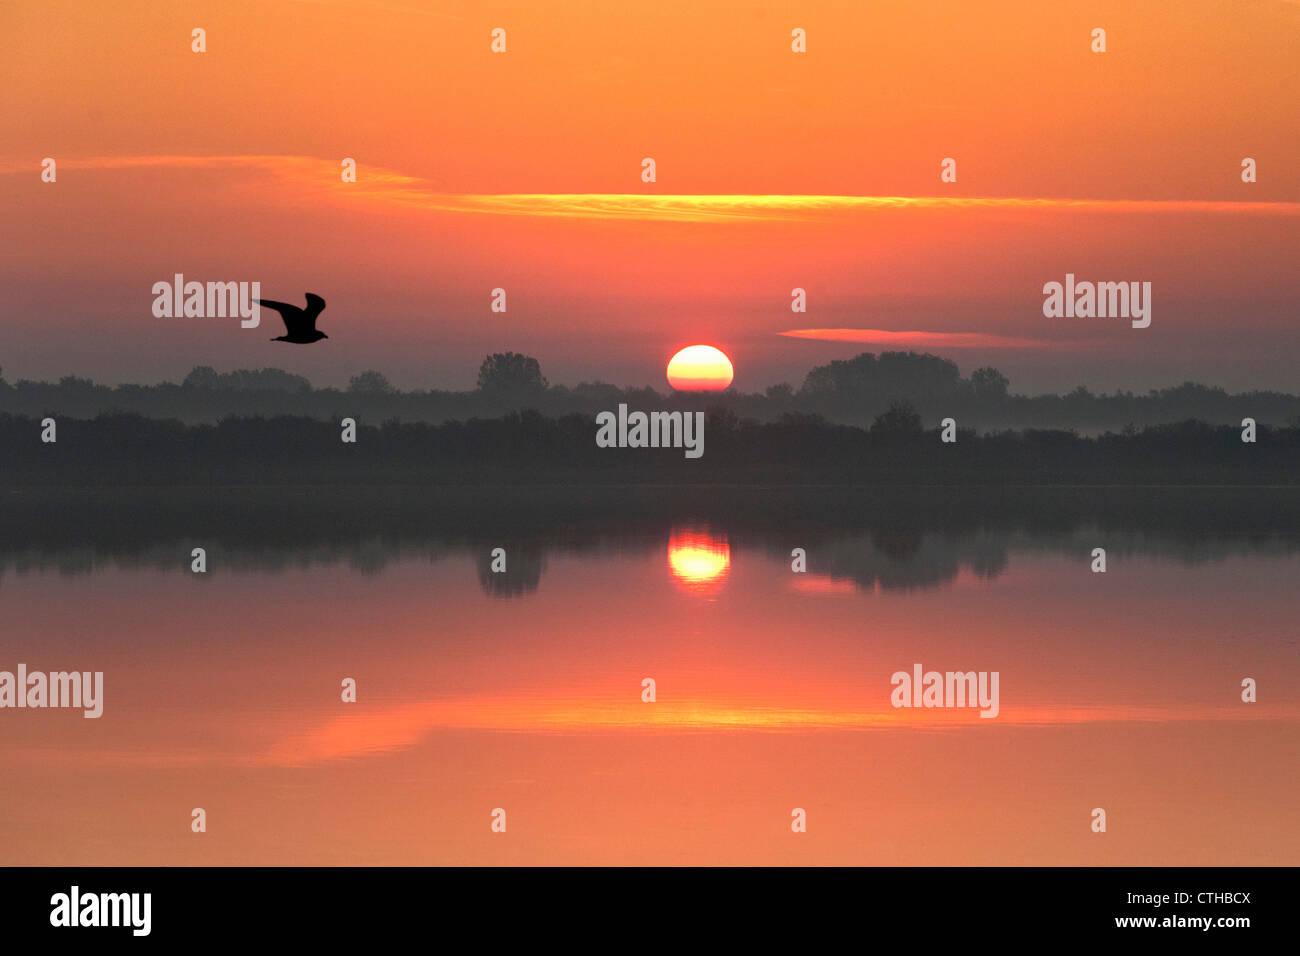 The Netherlands, Zierikzee, Sunrise. - Stock Image